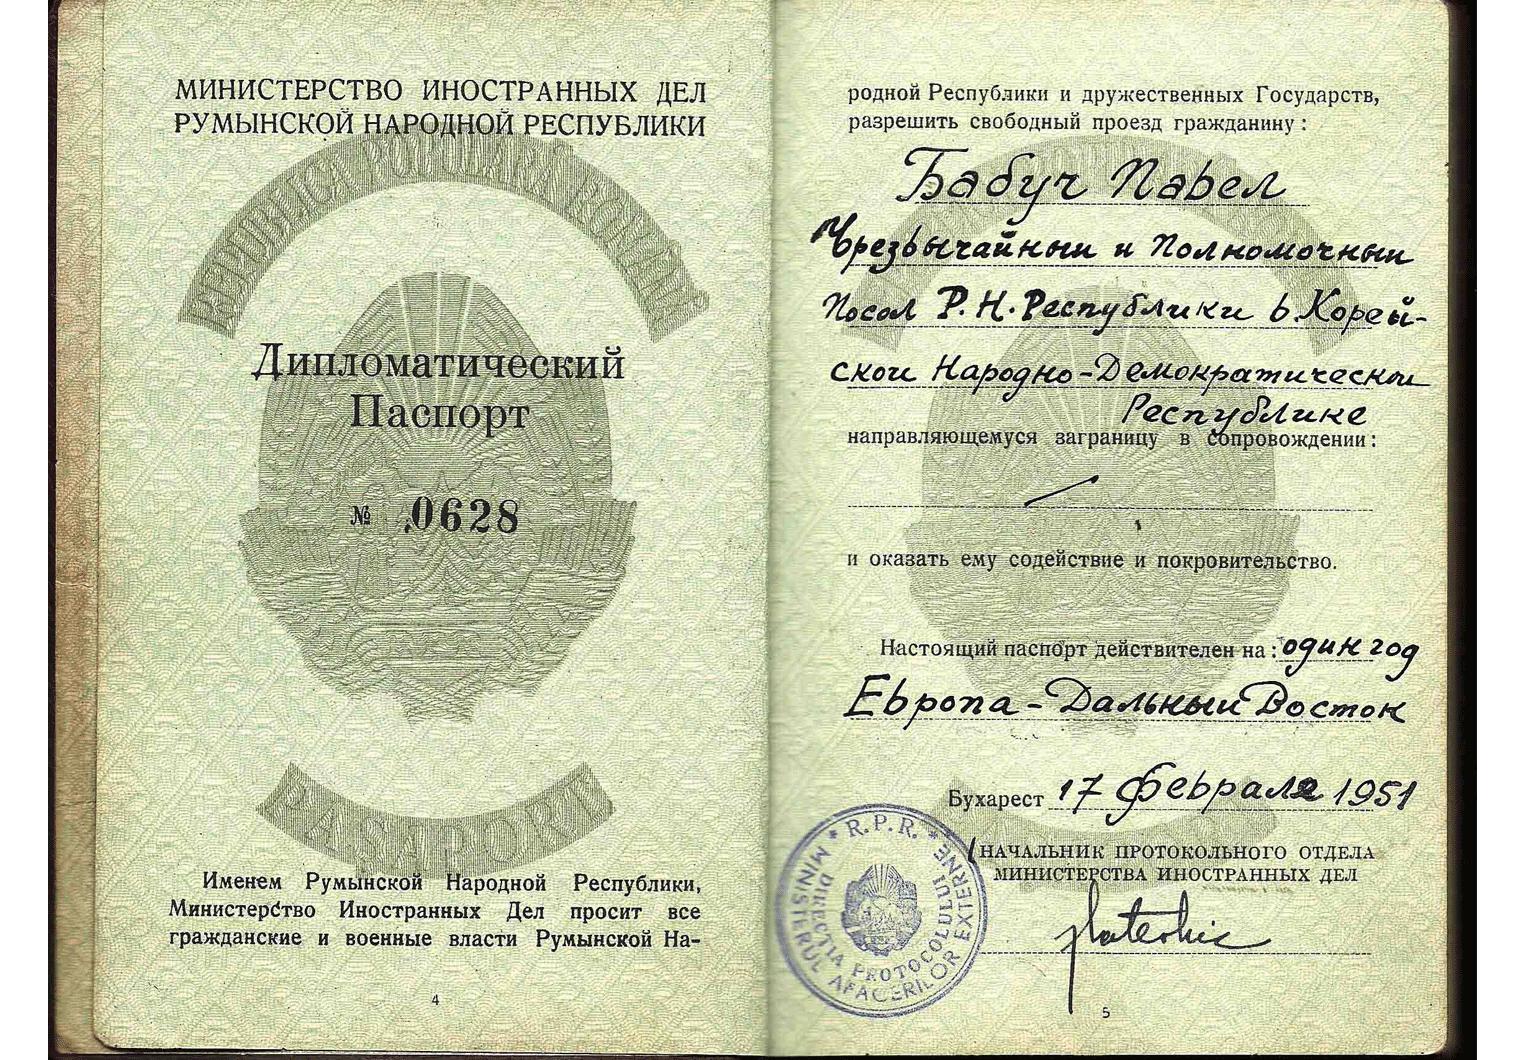 Rarest of visas - North Korean Diplomatic visa inside a 1951 passport